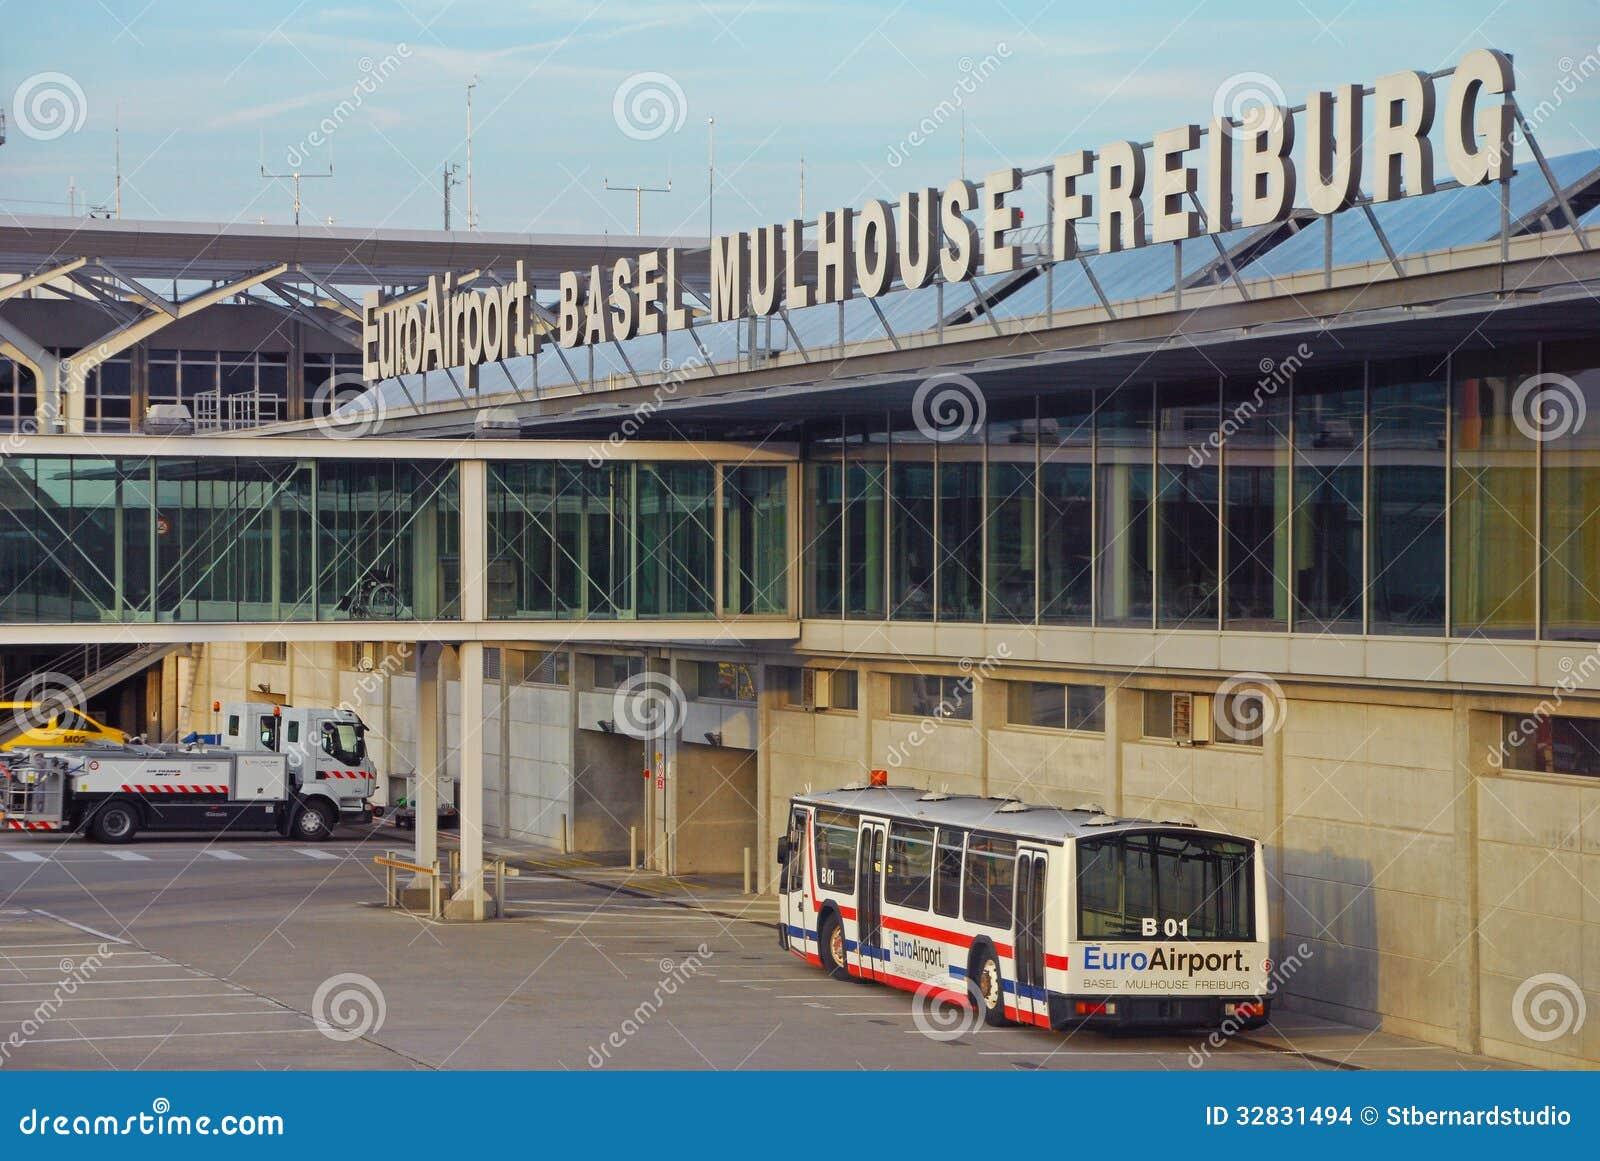 EuroAirport Basel Mulhouse Freiburg Editorial Stock Image Image - Basel mulhouse freiburg map